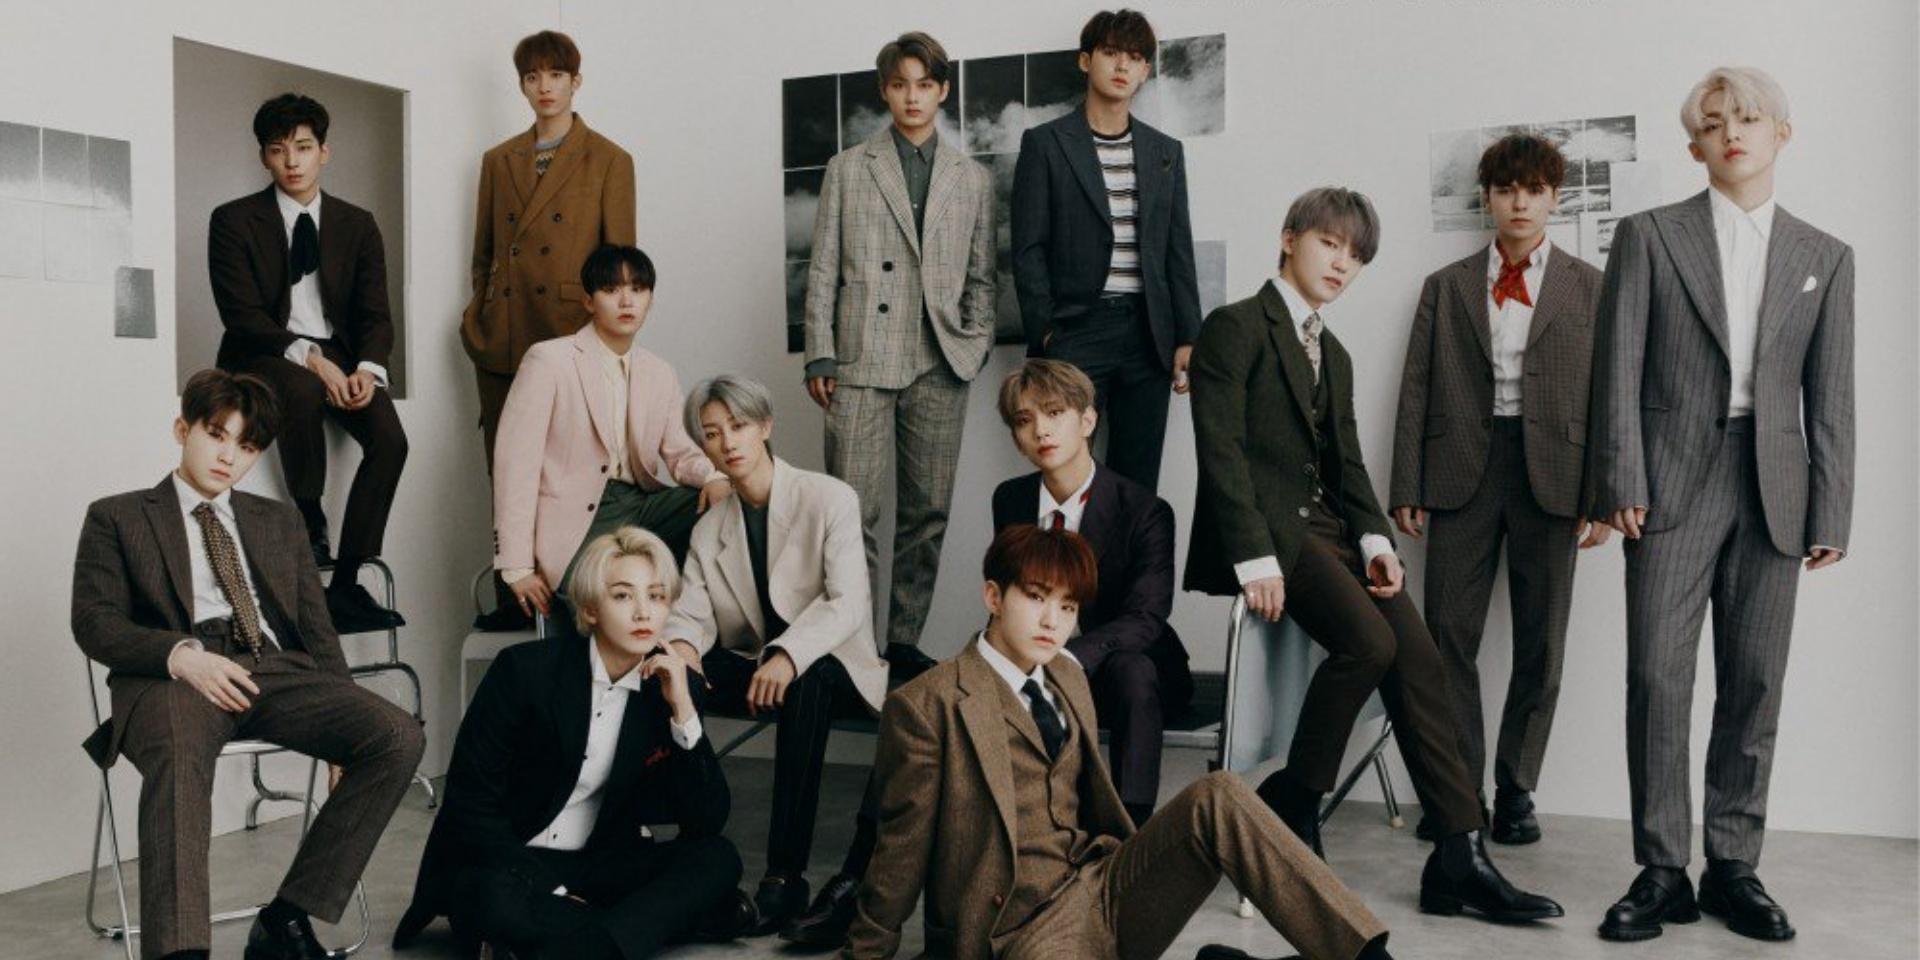 Seventeen's third album, An Ode, is out now